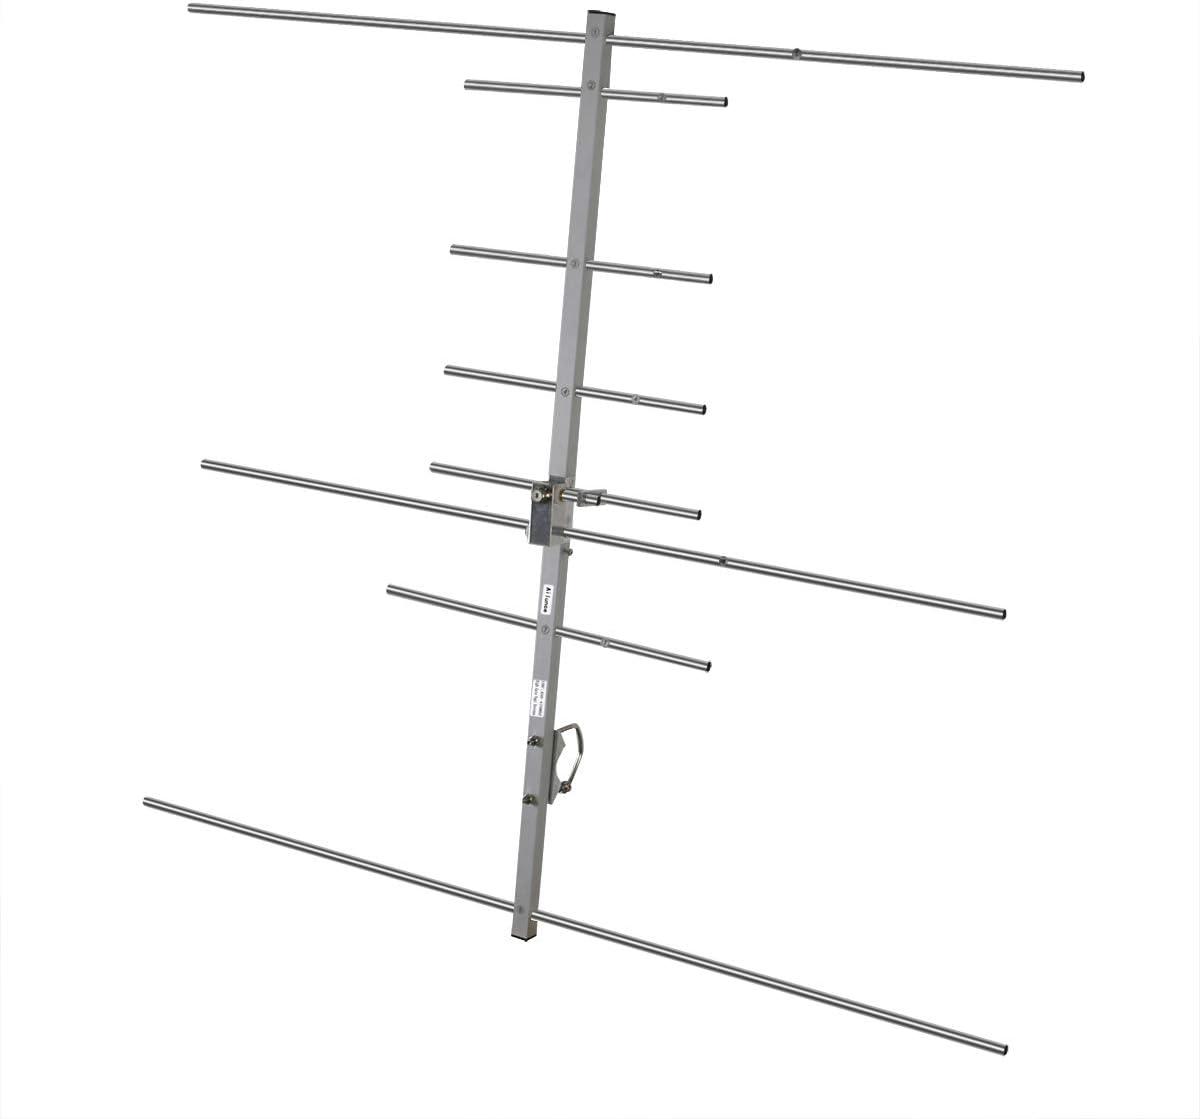 Ailunce AY04 Antena direccional Yagi UHF VHF 144 MHz 430 MHz Antena de alta ganancia 9.5/11.5 dBi para transmisores móviles de radio bidireccional (1 ...